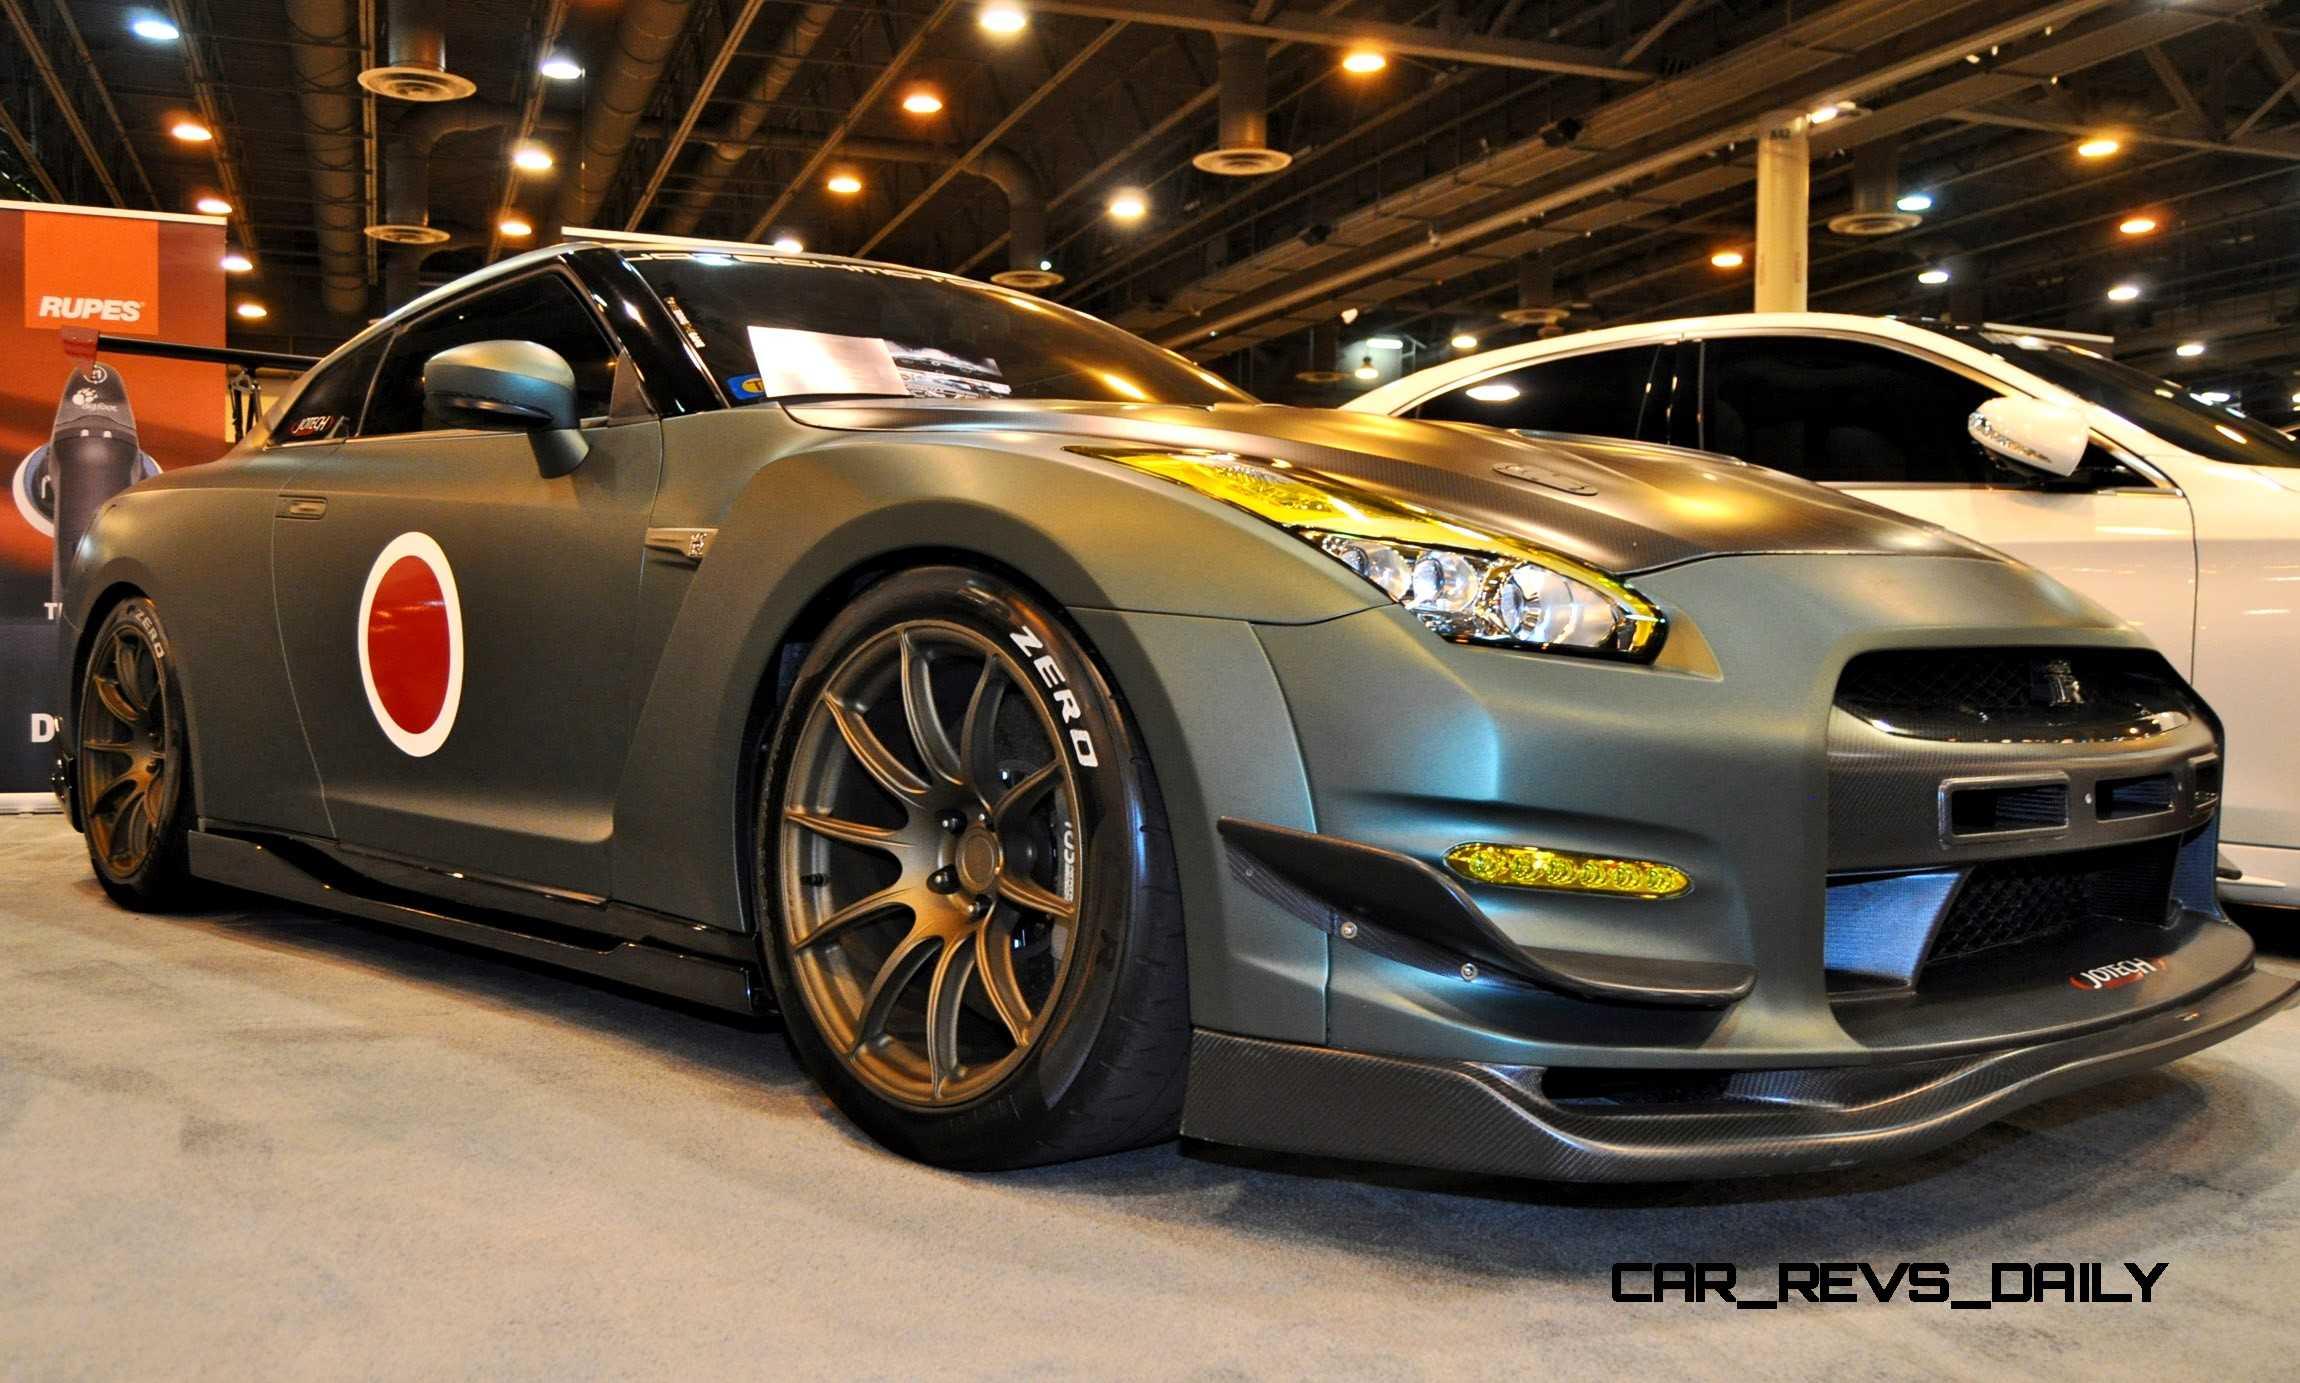 2015 Nissan GTR in Imperial Japanese Army Zero WarPaint